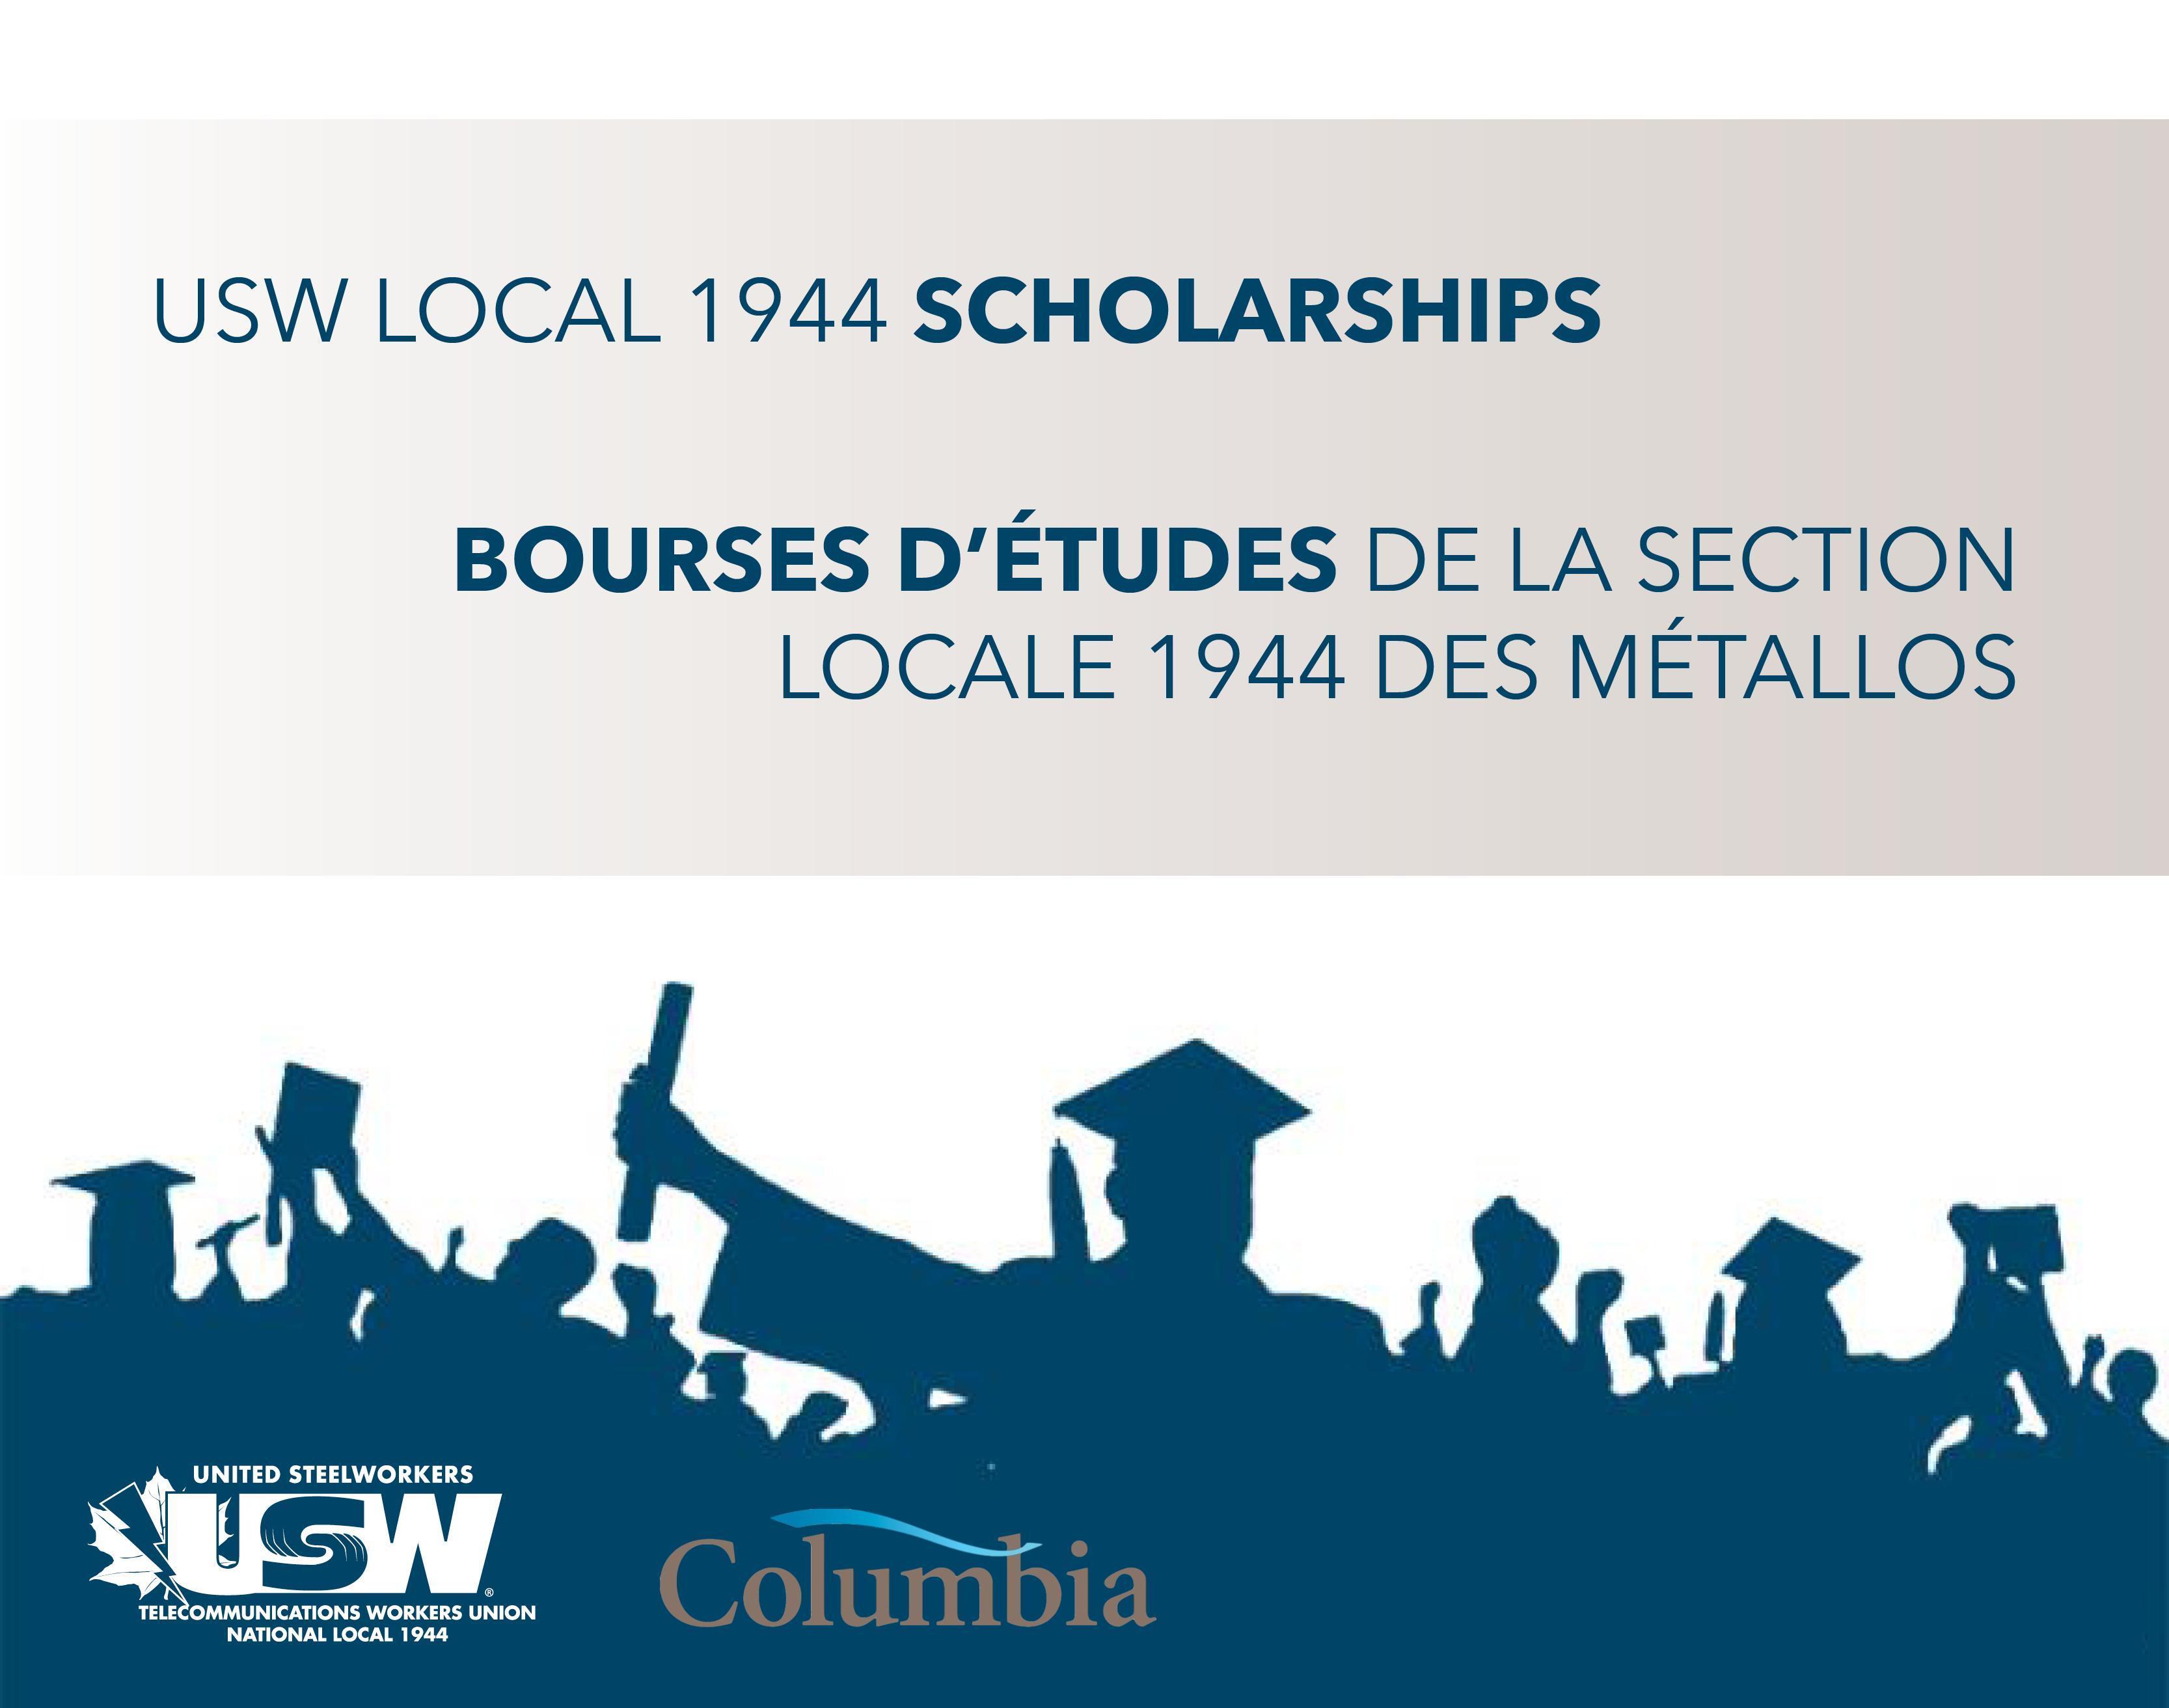 USW Local 1944 Scholarships